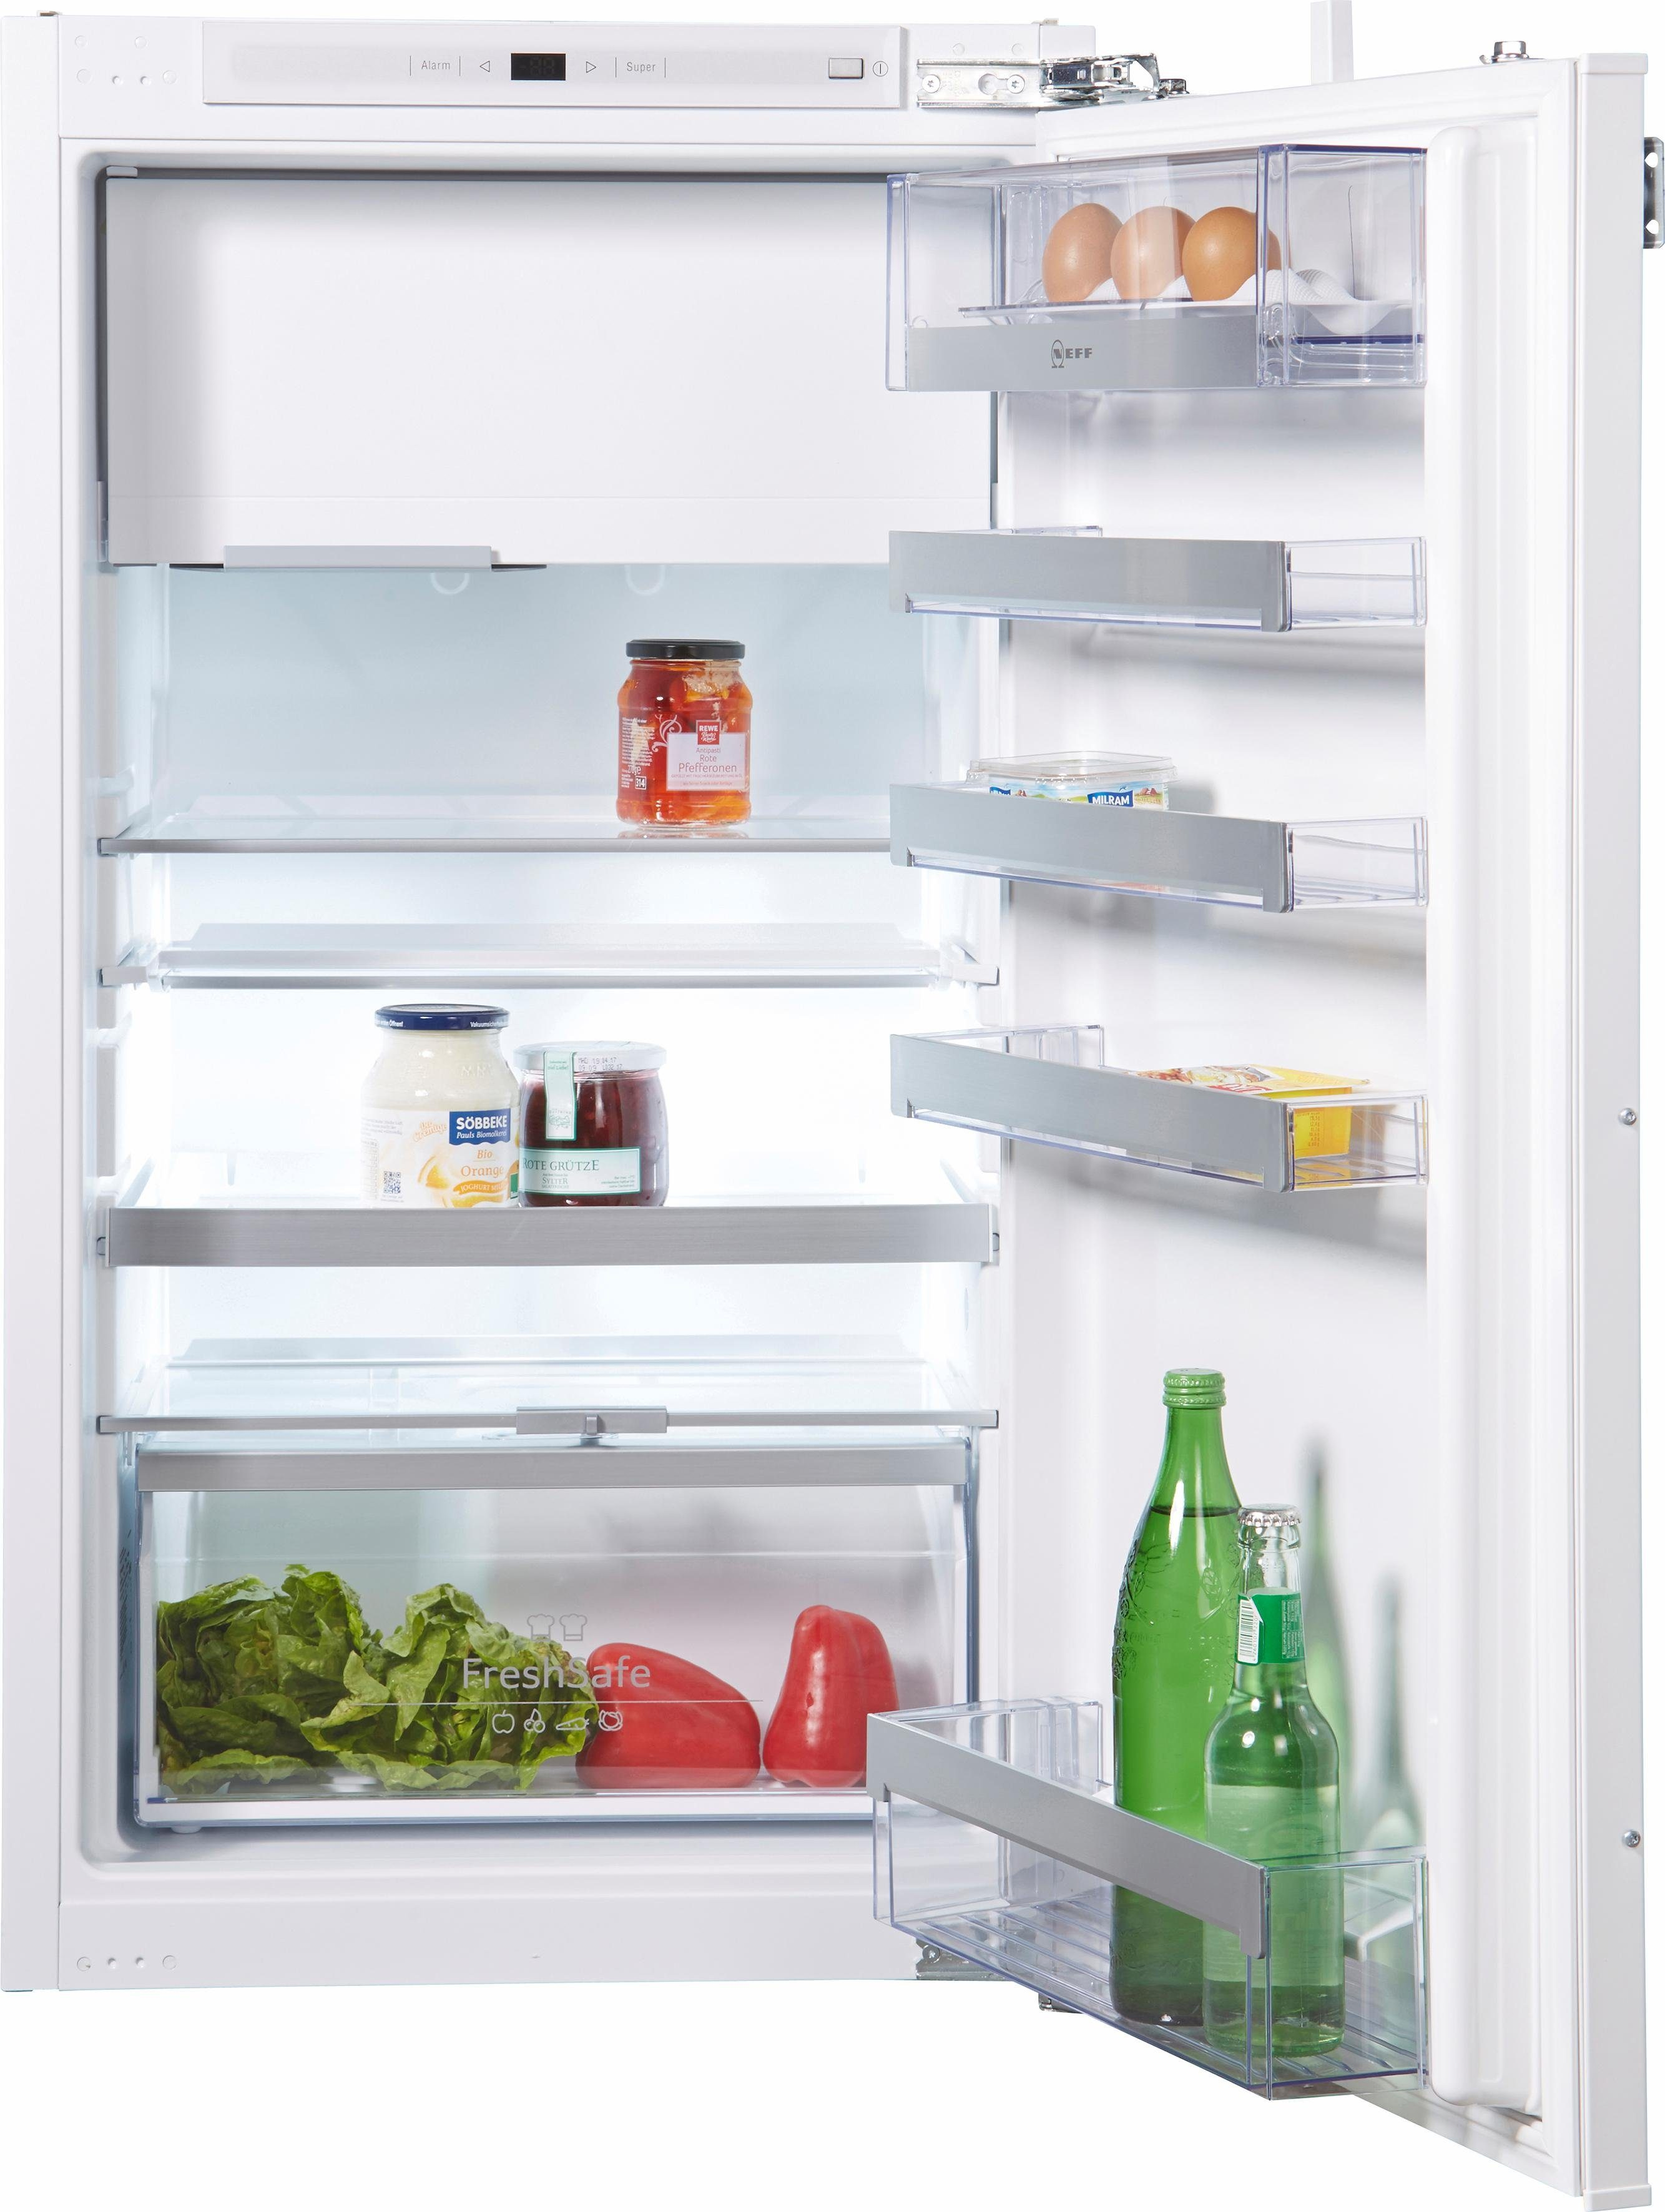 NEFF Einbaukühlschrank K345A2 / KI2323F30, 102,1 cm hoch, 55,8 cm breit, integrierbar